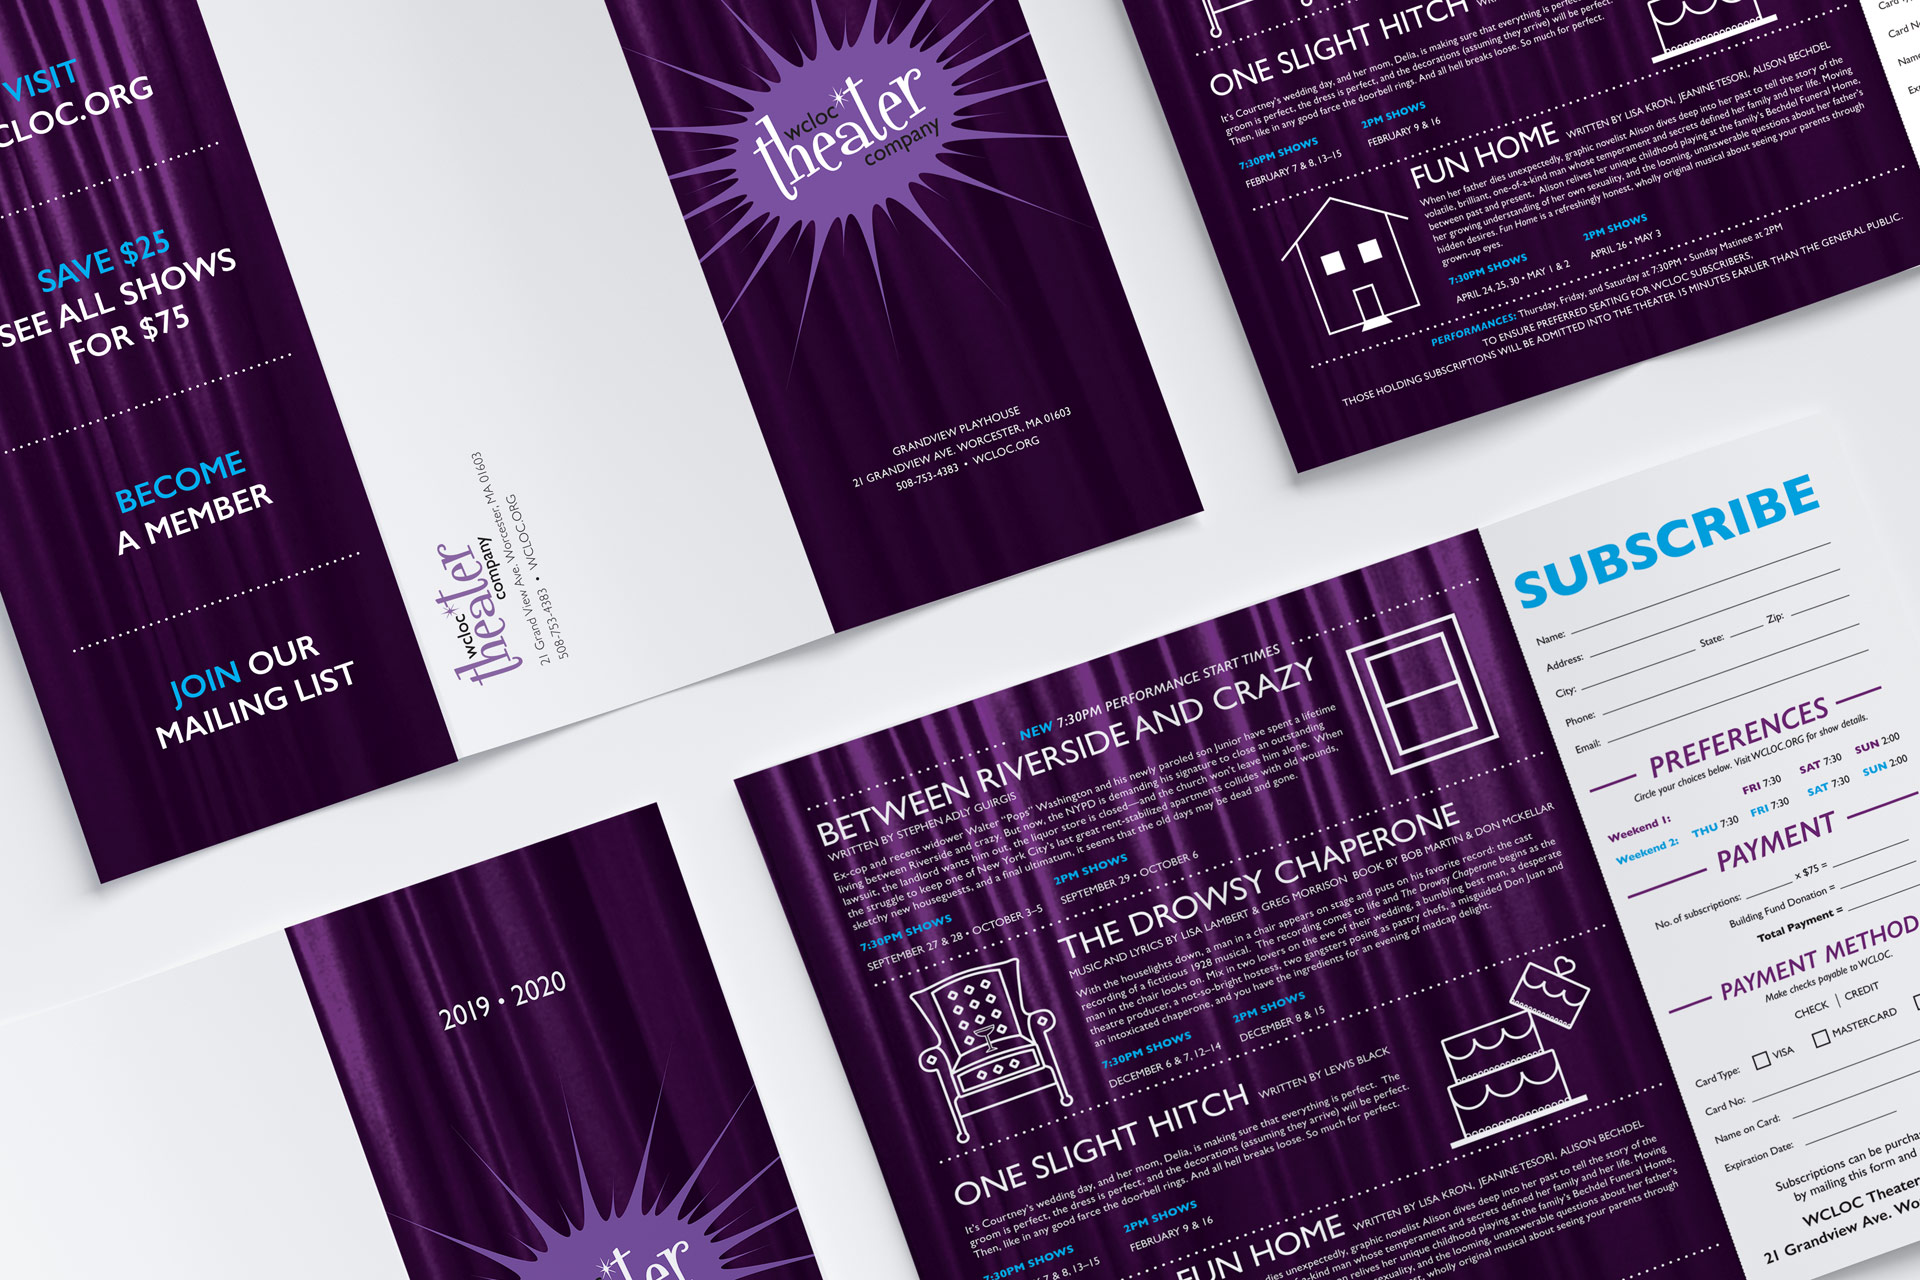 WCLOC Theater 2019-2020 Brochure Design